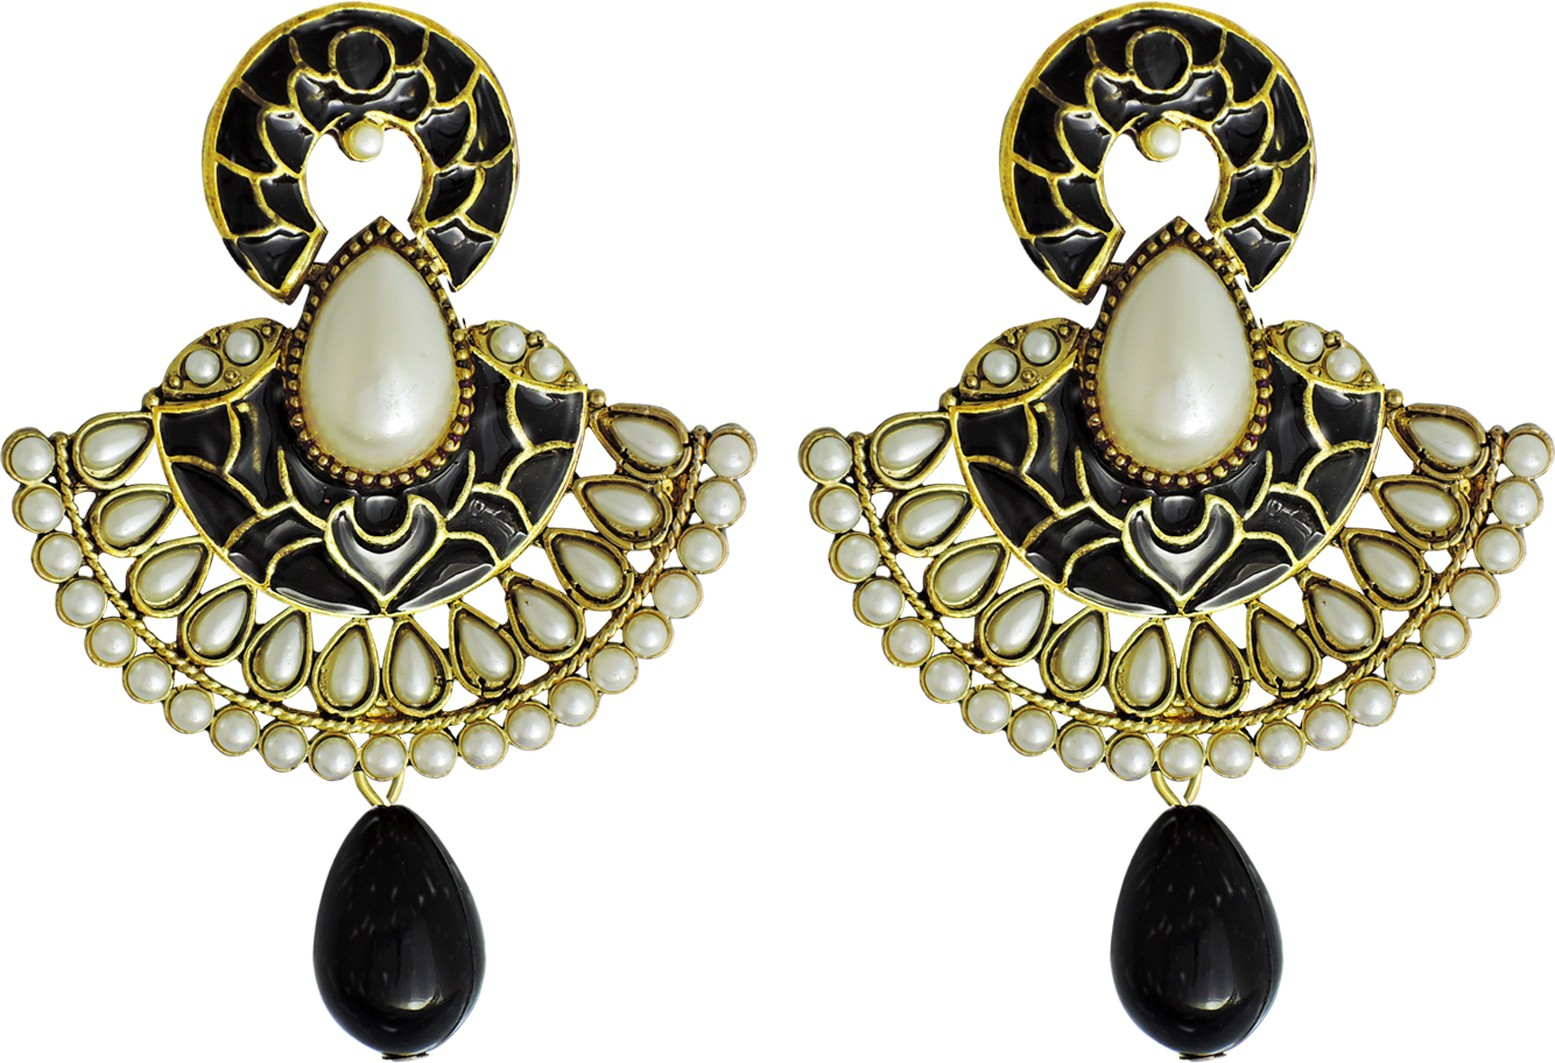 Deals - Delhi - Under Rs.999 <br> Earrings, Pendants, Rings...<br> Category - jewellery<br> Business - Flipkart.com